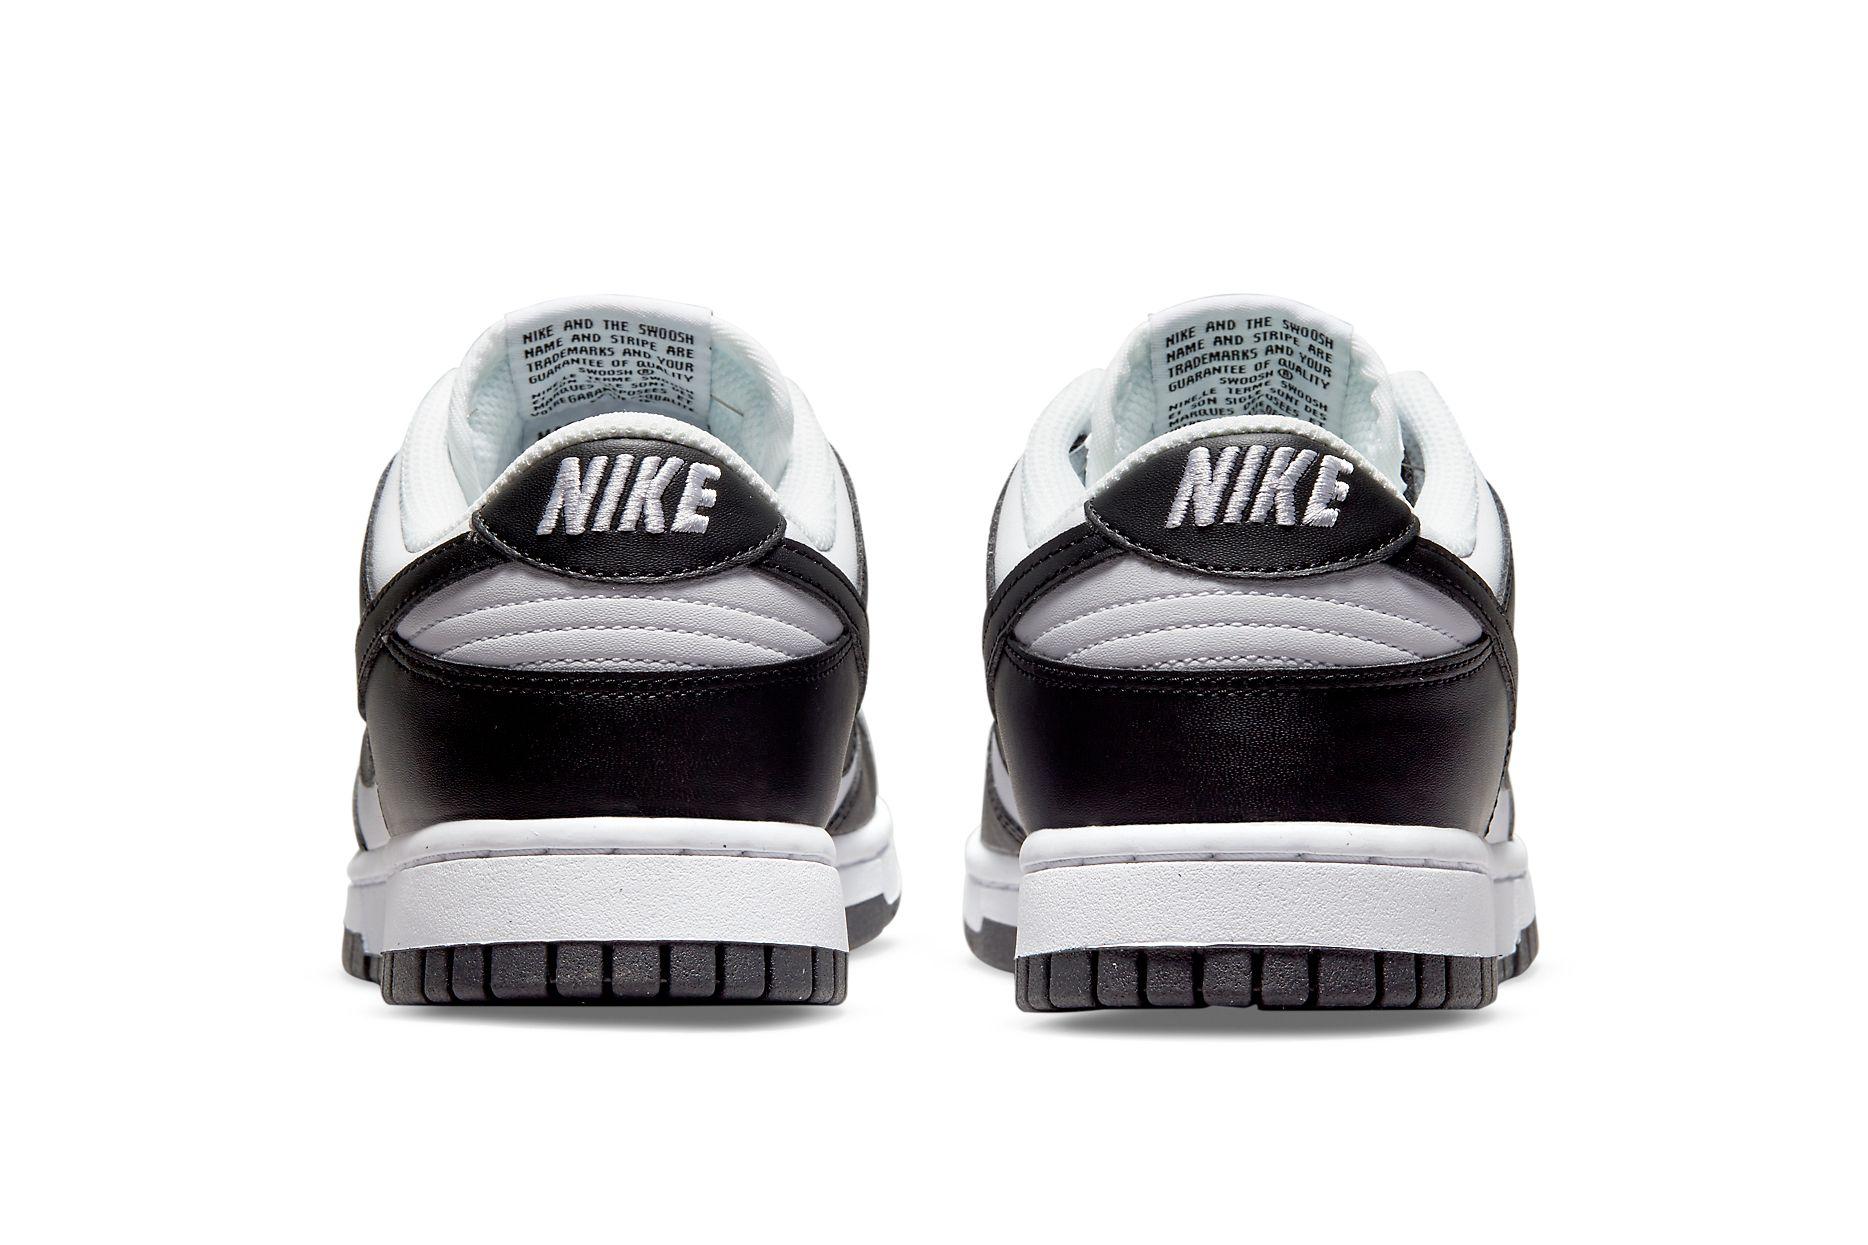 Nike Dunk Low 'Next Nature' White/Black